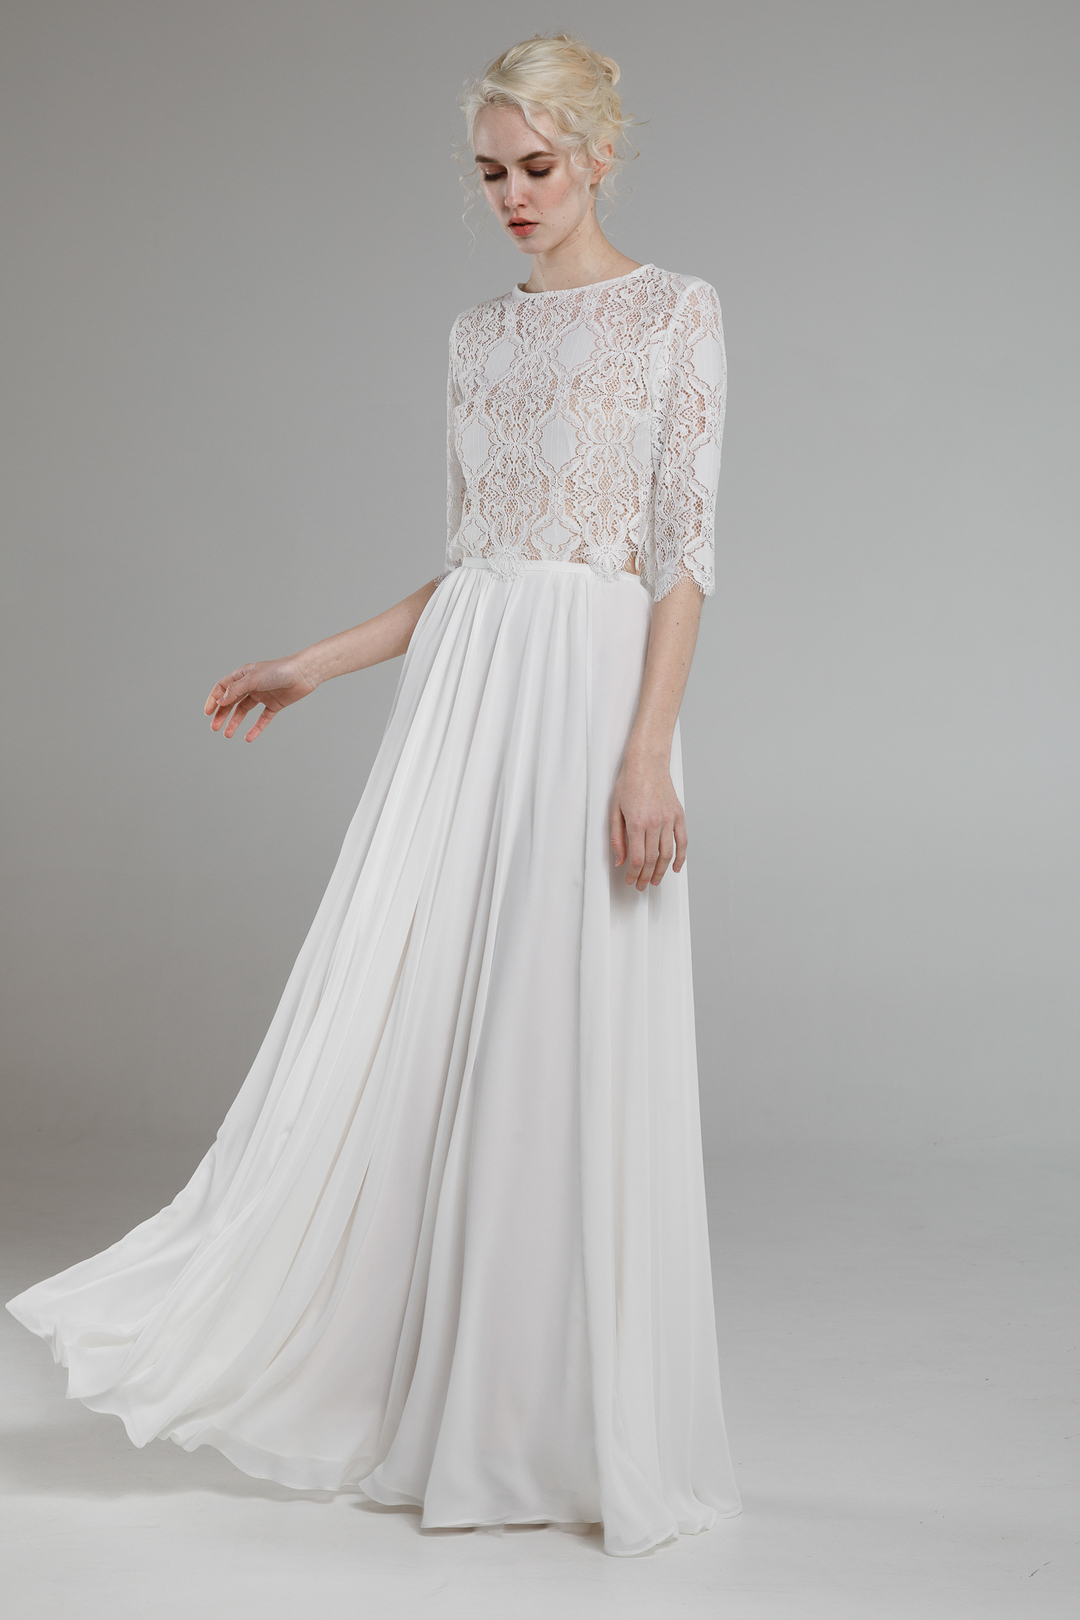 venus top & selena skirt dress photo